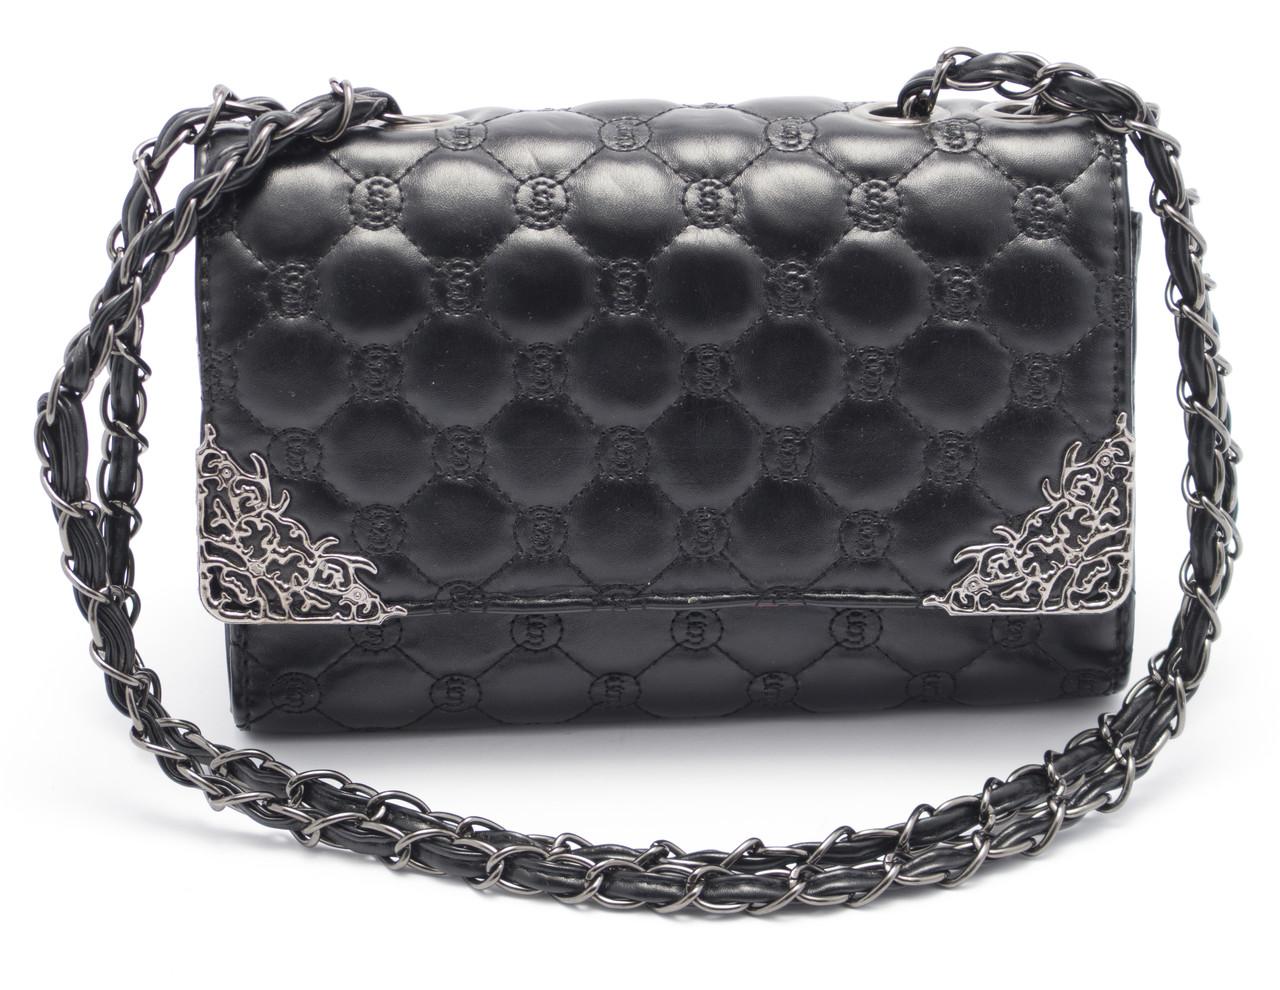 Классная женская черная сумочка Б/Н art. 1002-4